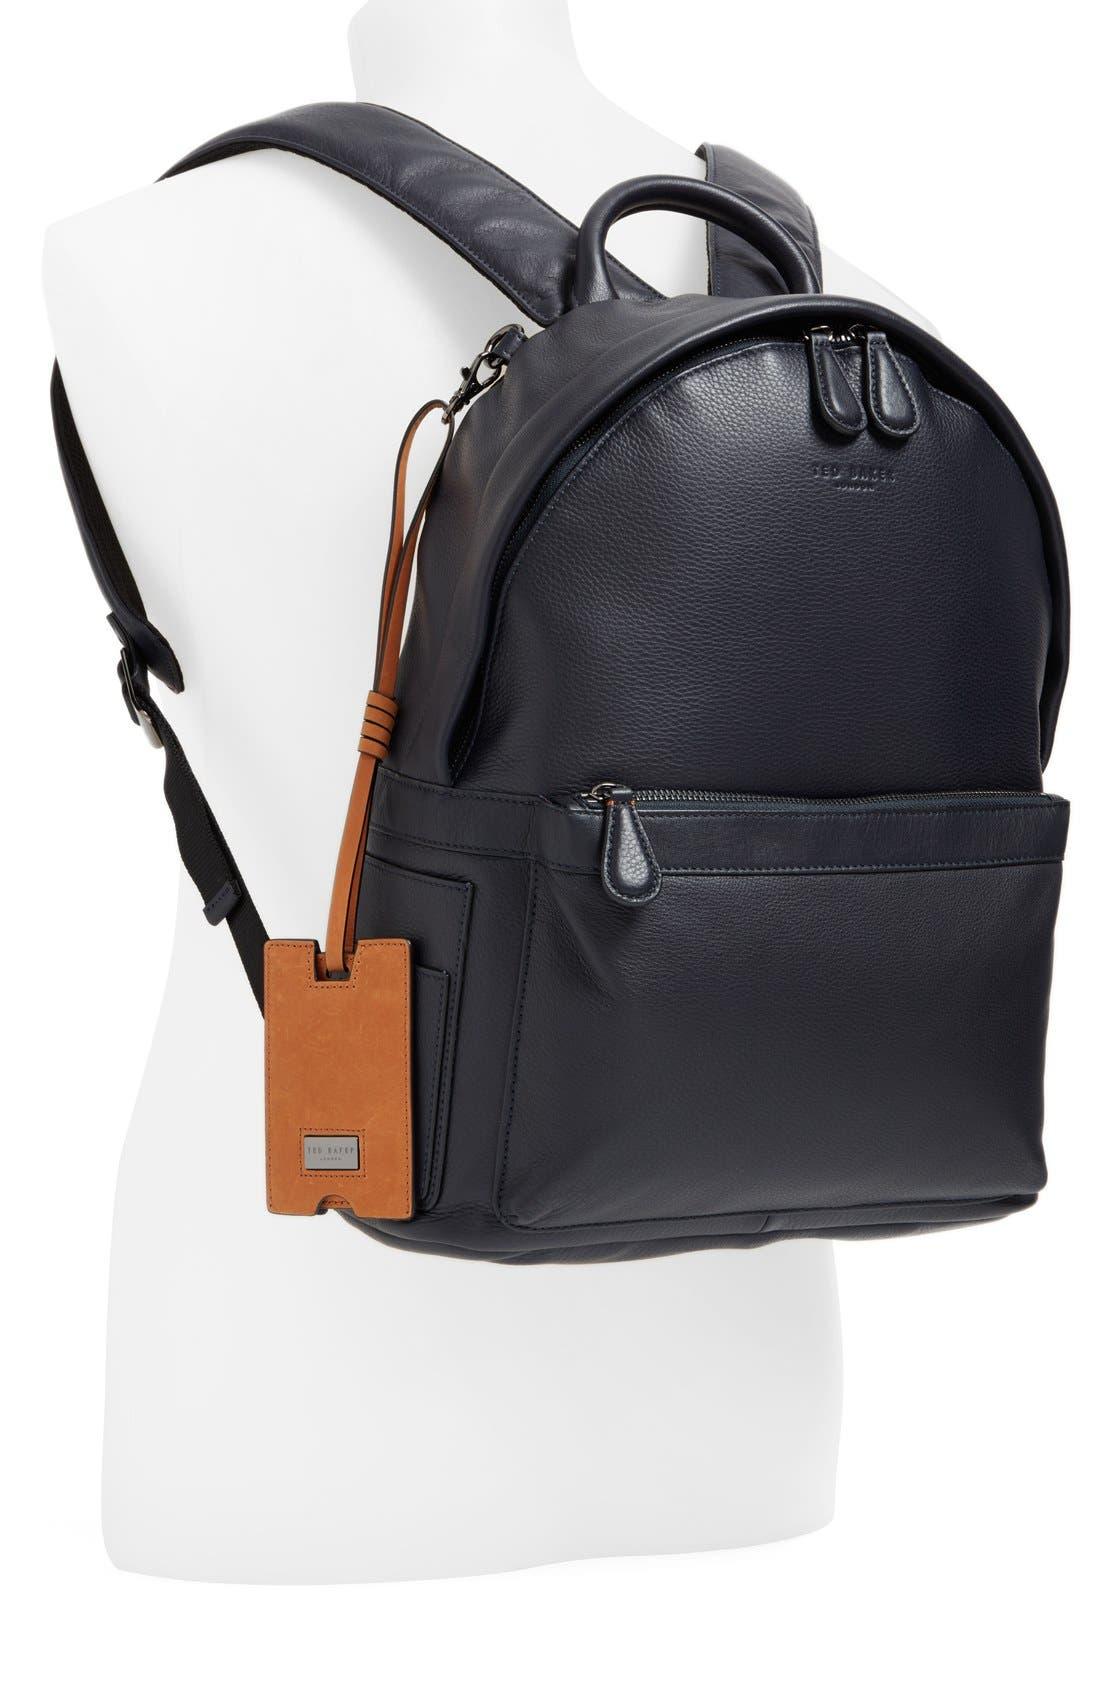 TED BAKER LONDON, 'Dollar' Leather Backpack, Alternate thumbnail 2, color, 410